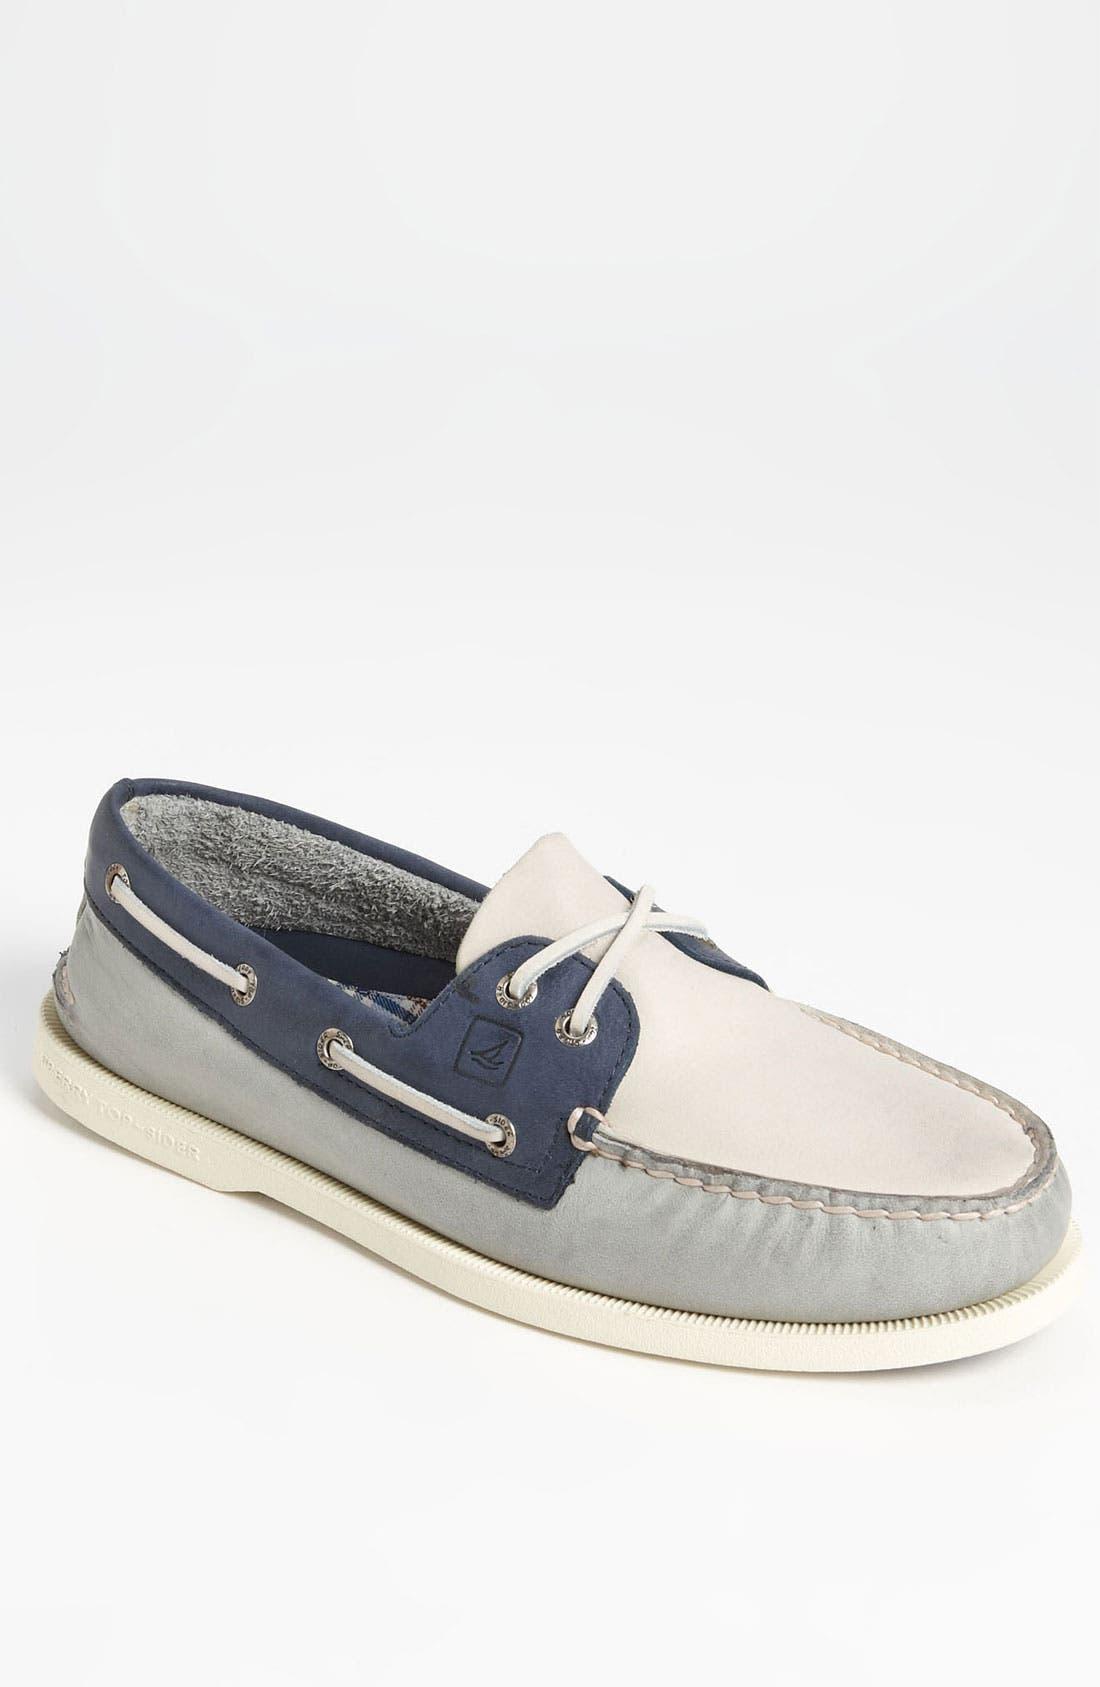 Alternate Image 1 Selected - Sperry Top-Sider® 'Authentic Original' Burnished Boat Shoe (Men)